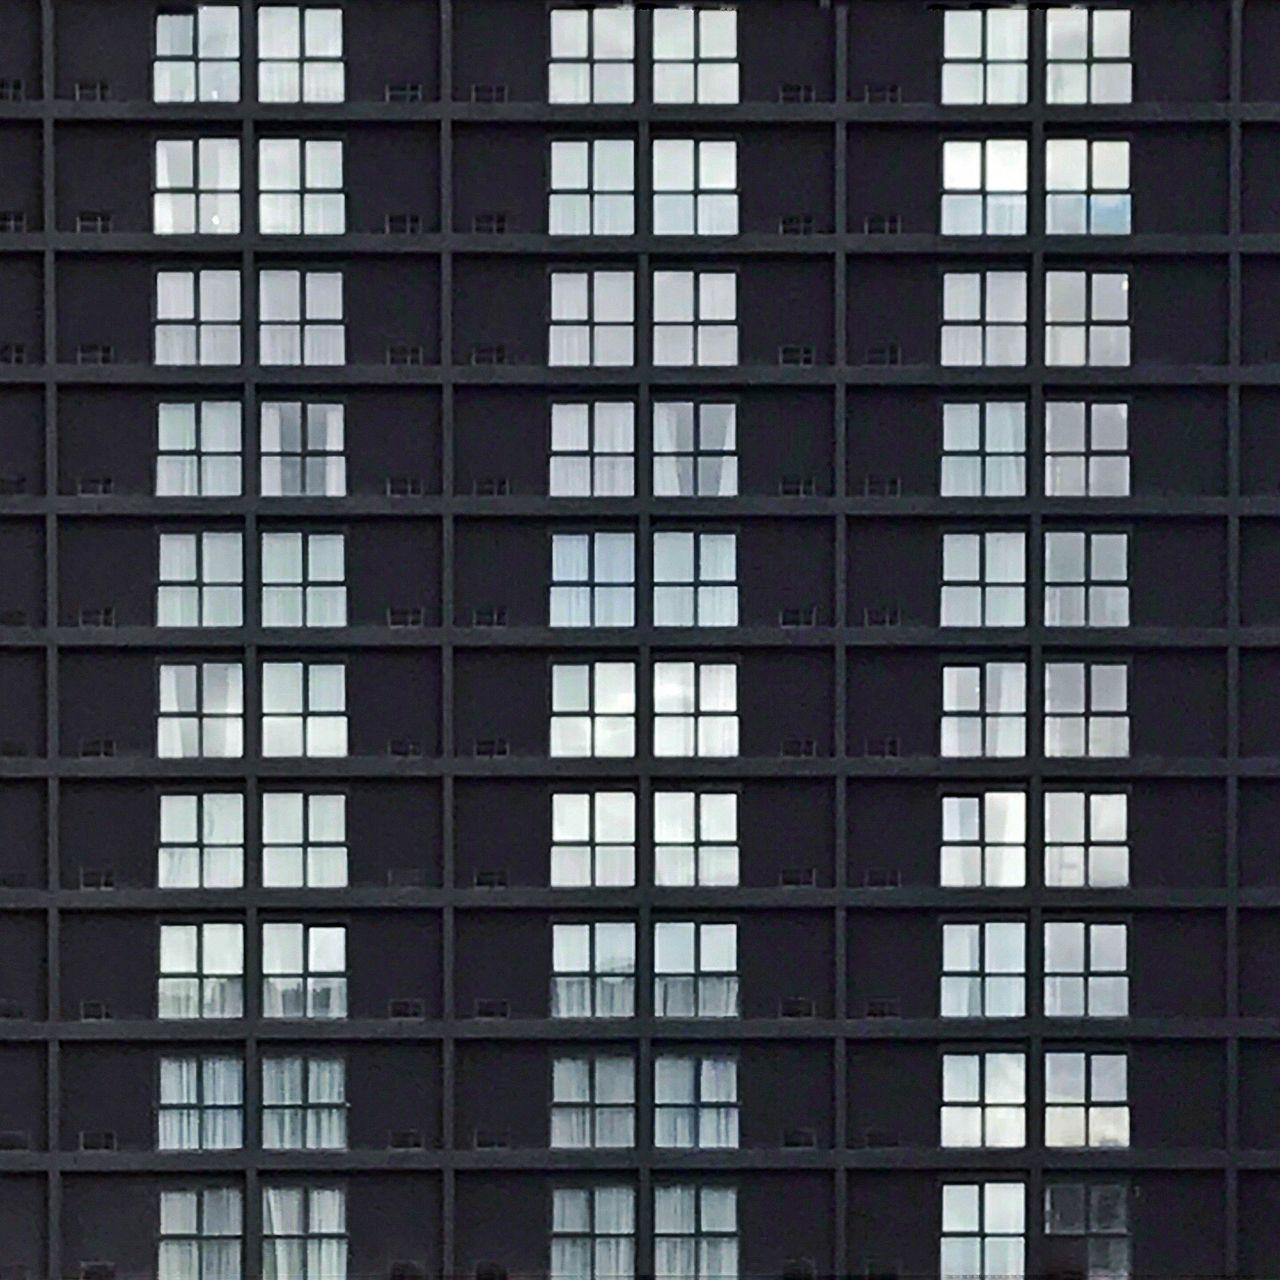 """59"" Architecture Building Exterior Minimalism Minimalobsession Minimalistic Architecture Minimalist Façade Minimalist Architecture Architecturelovers Full Frame"